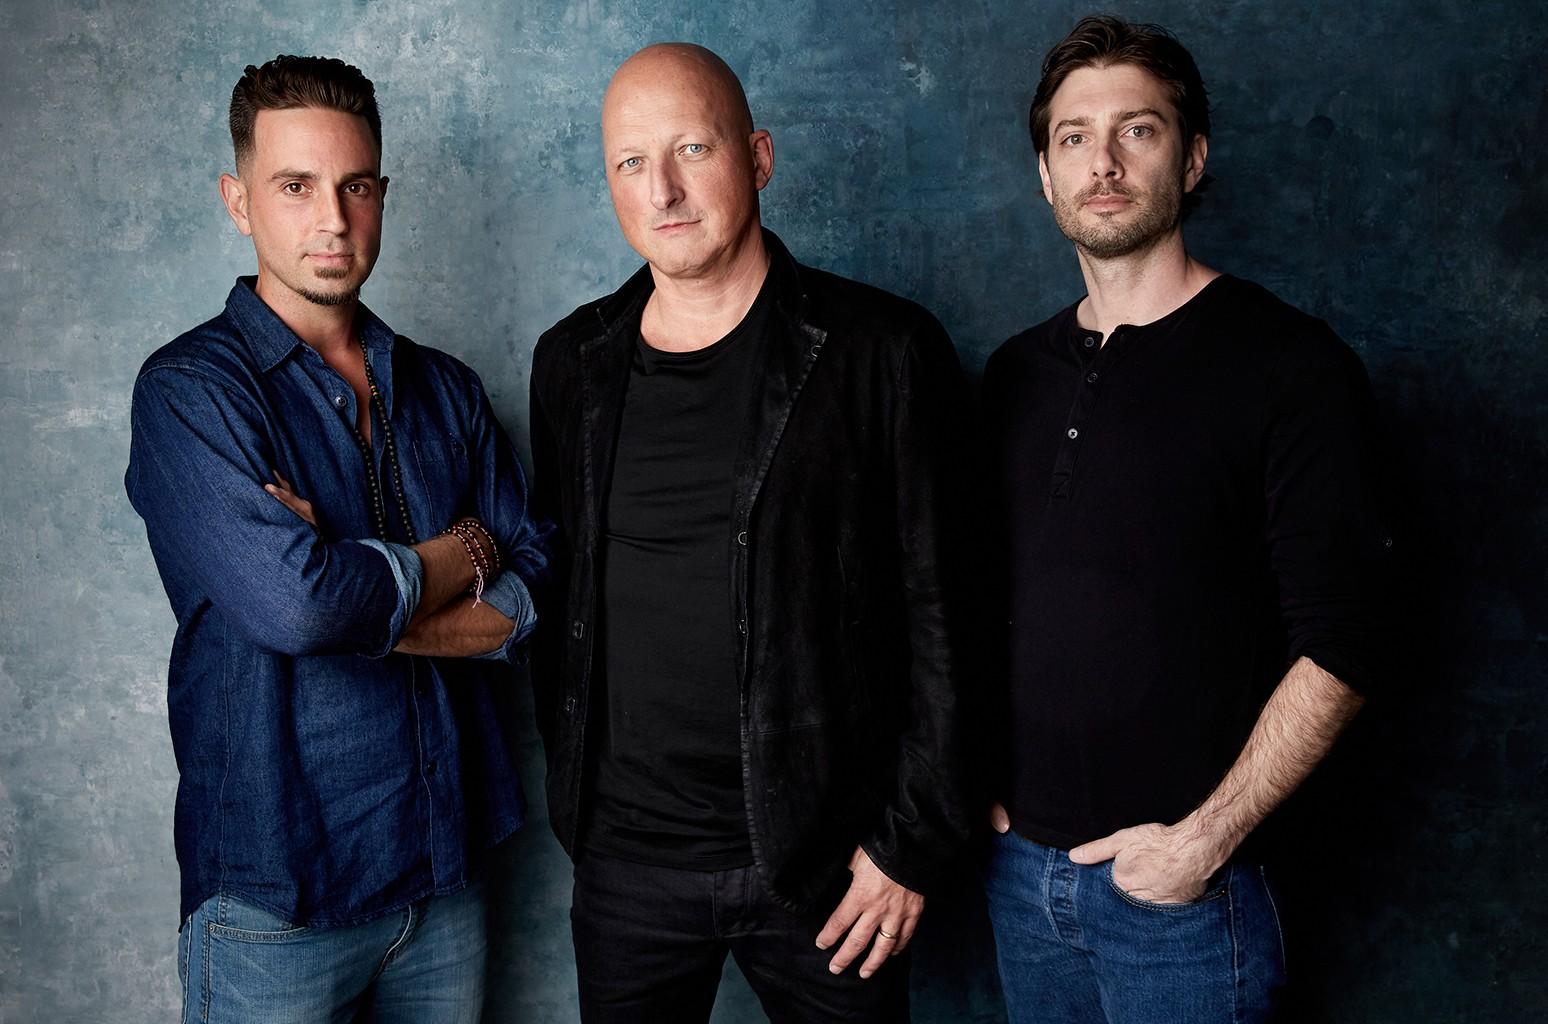 Wade Robson, Dan Reed and James Safechuck